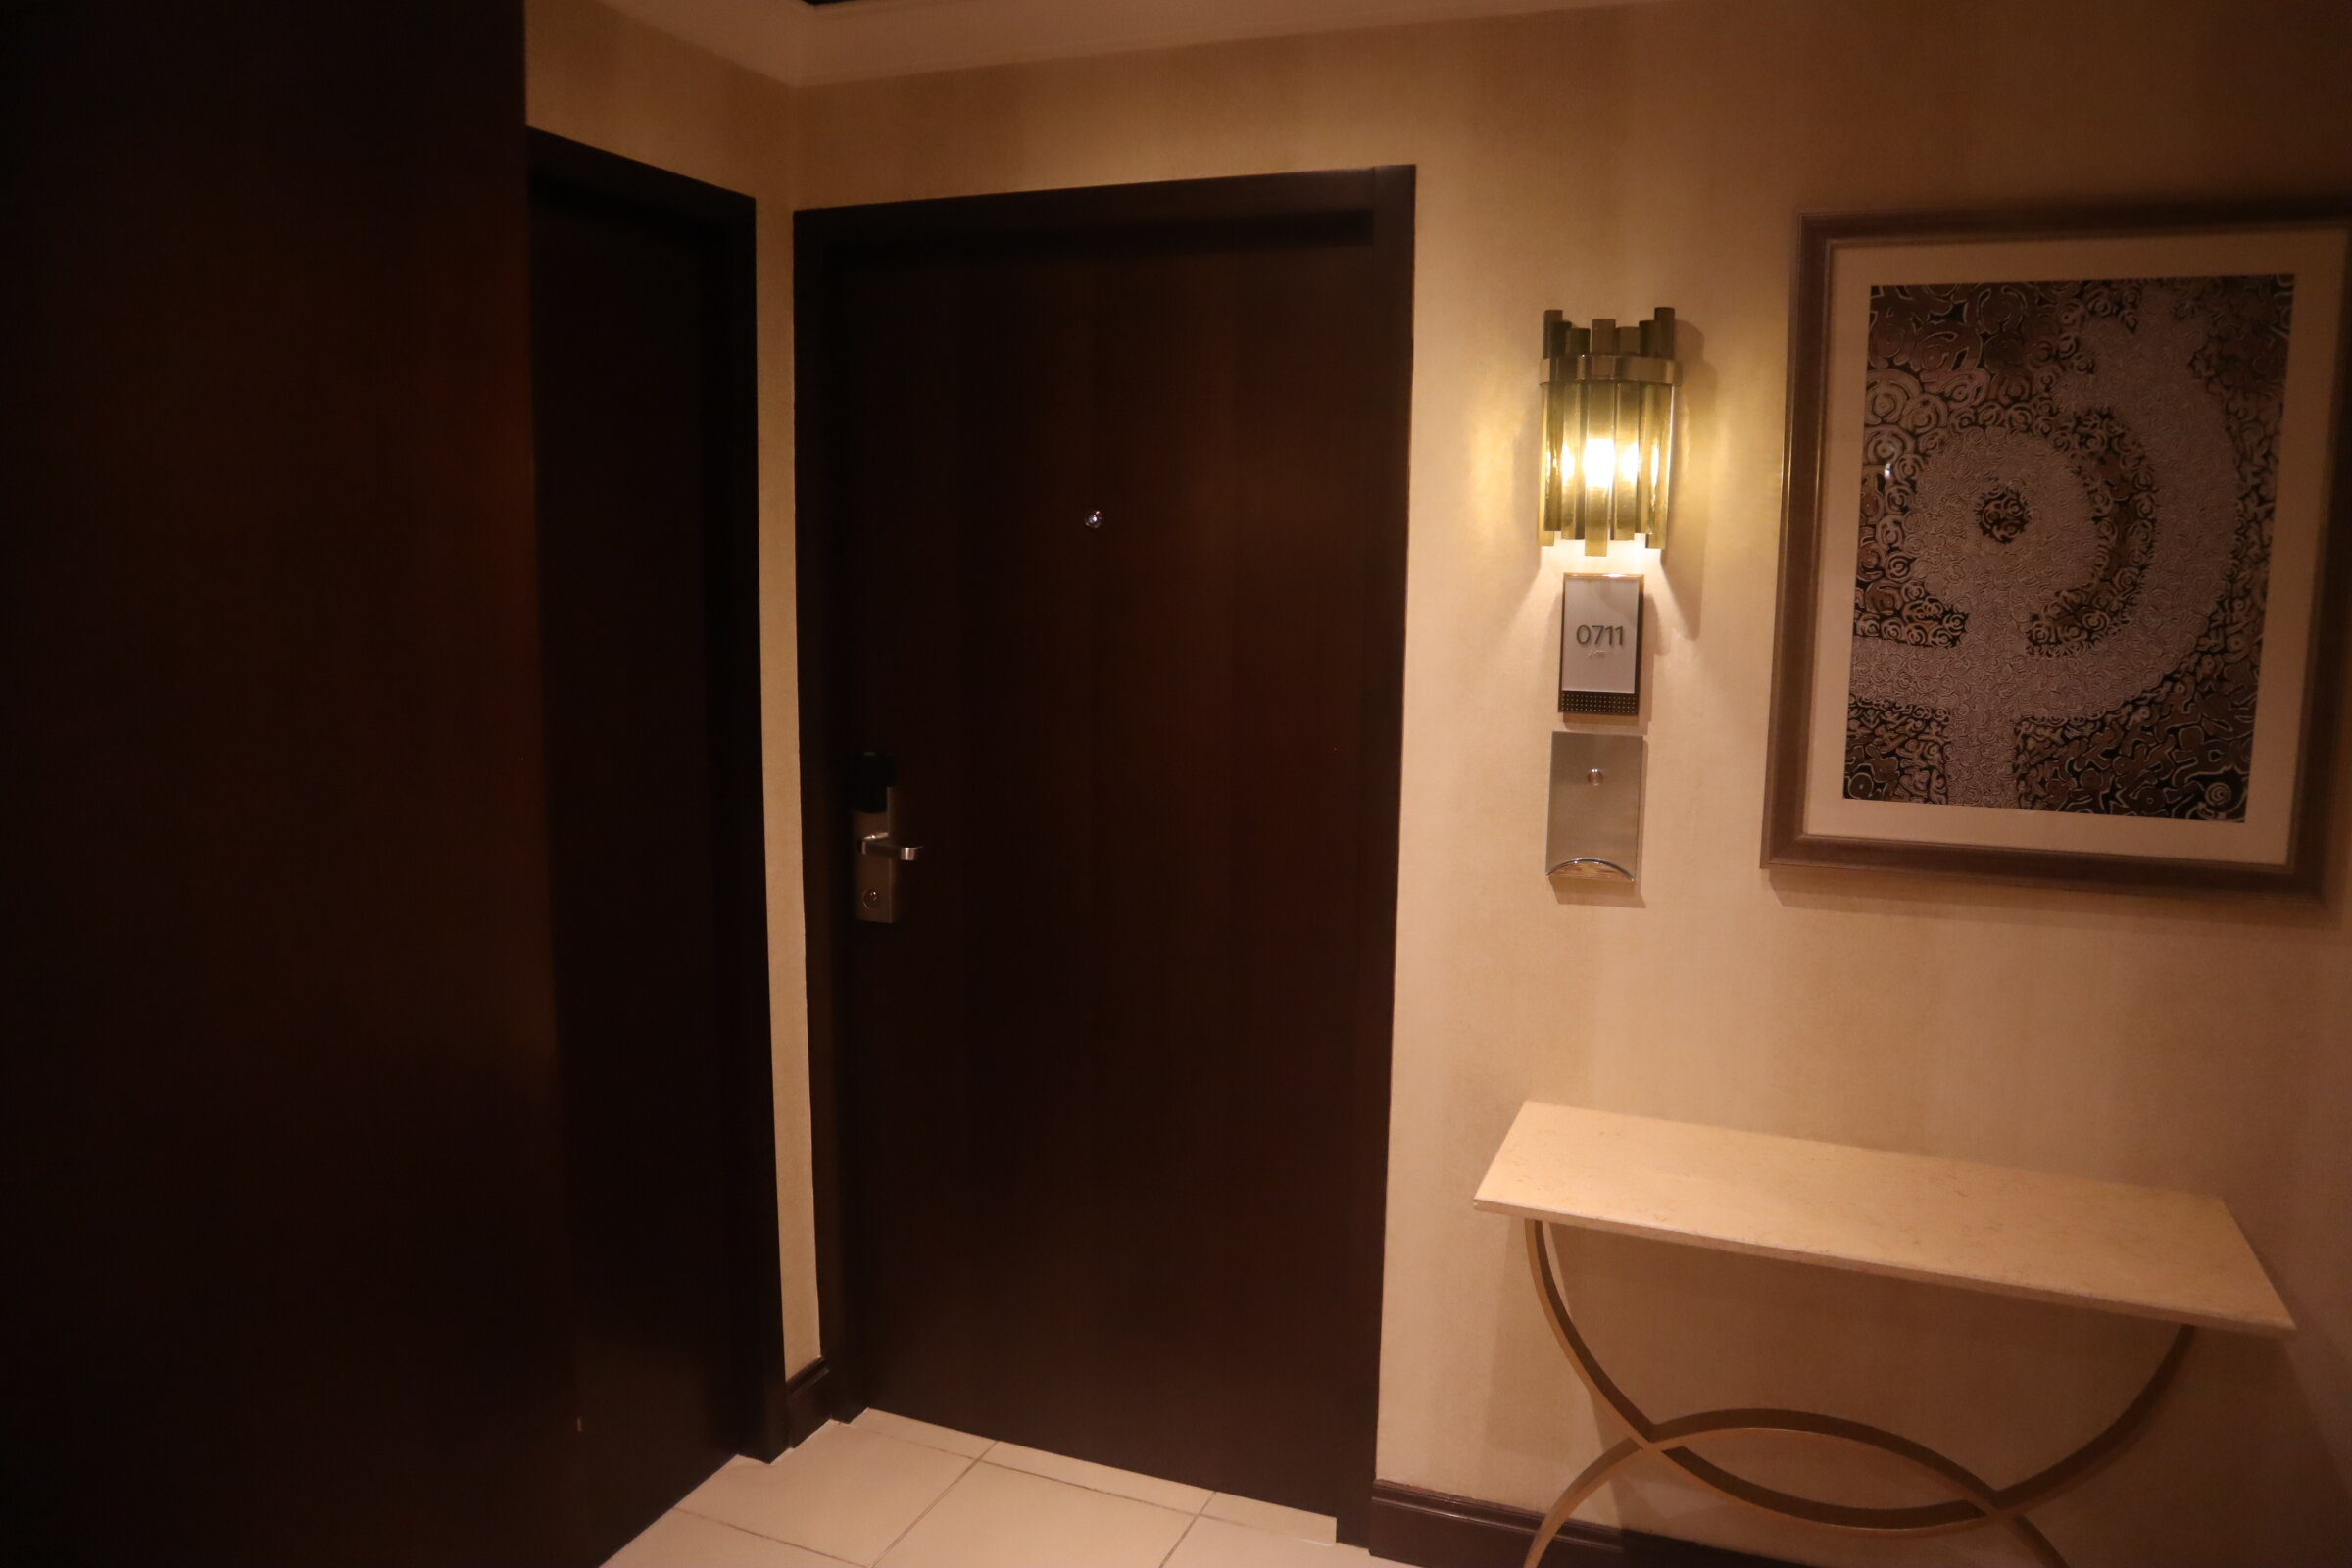 Sheraton Oman – Room 711